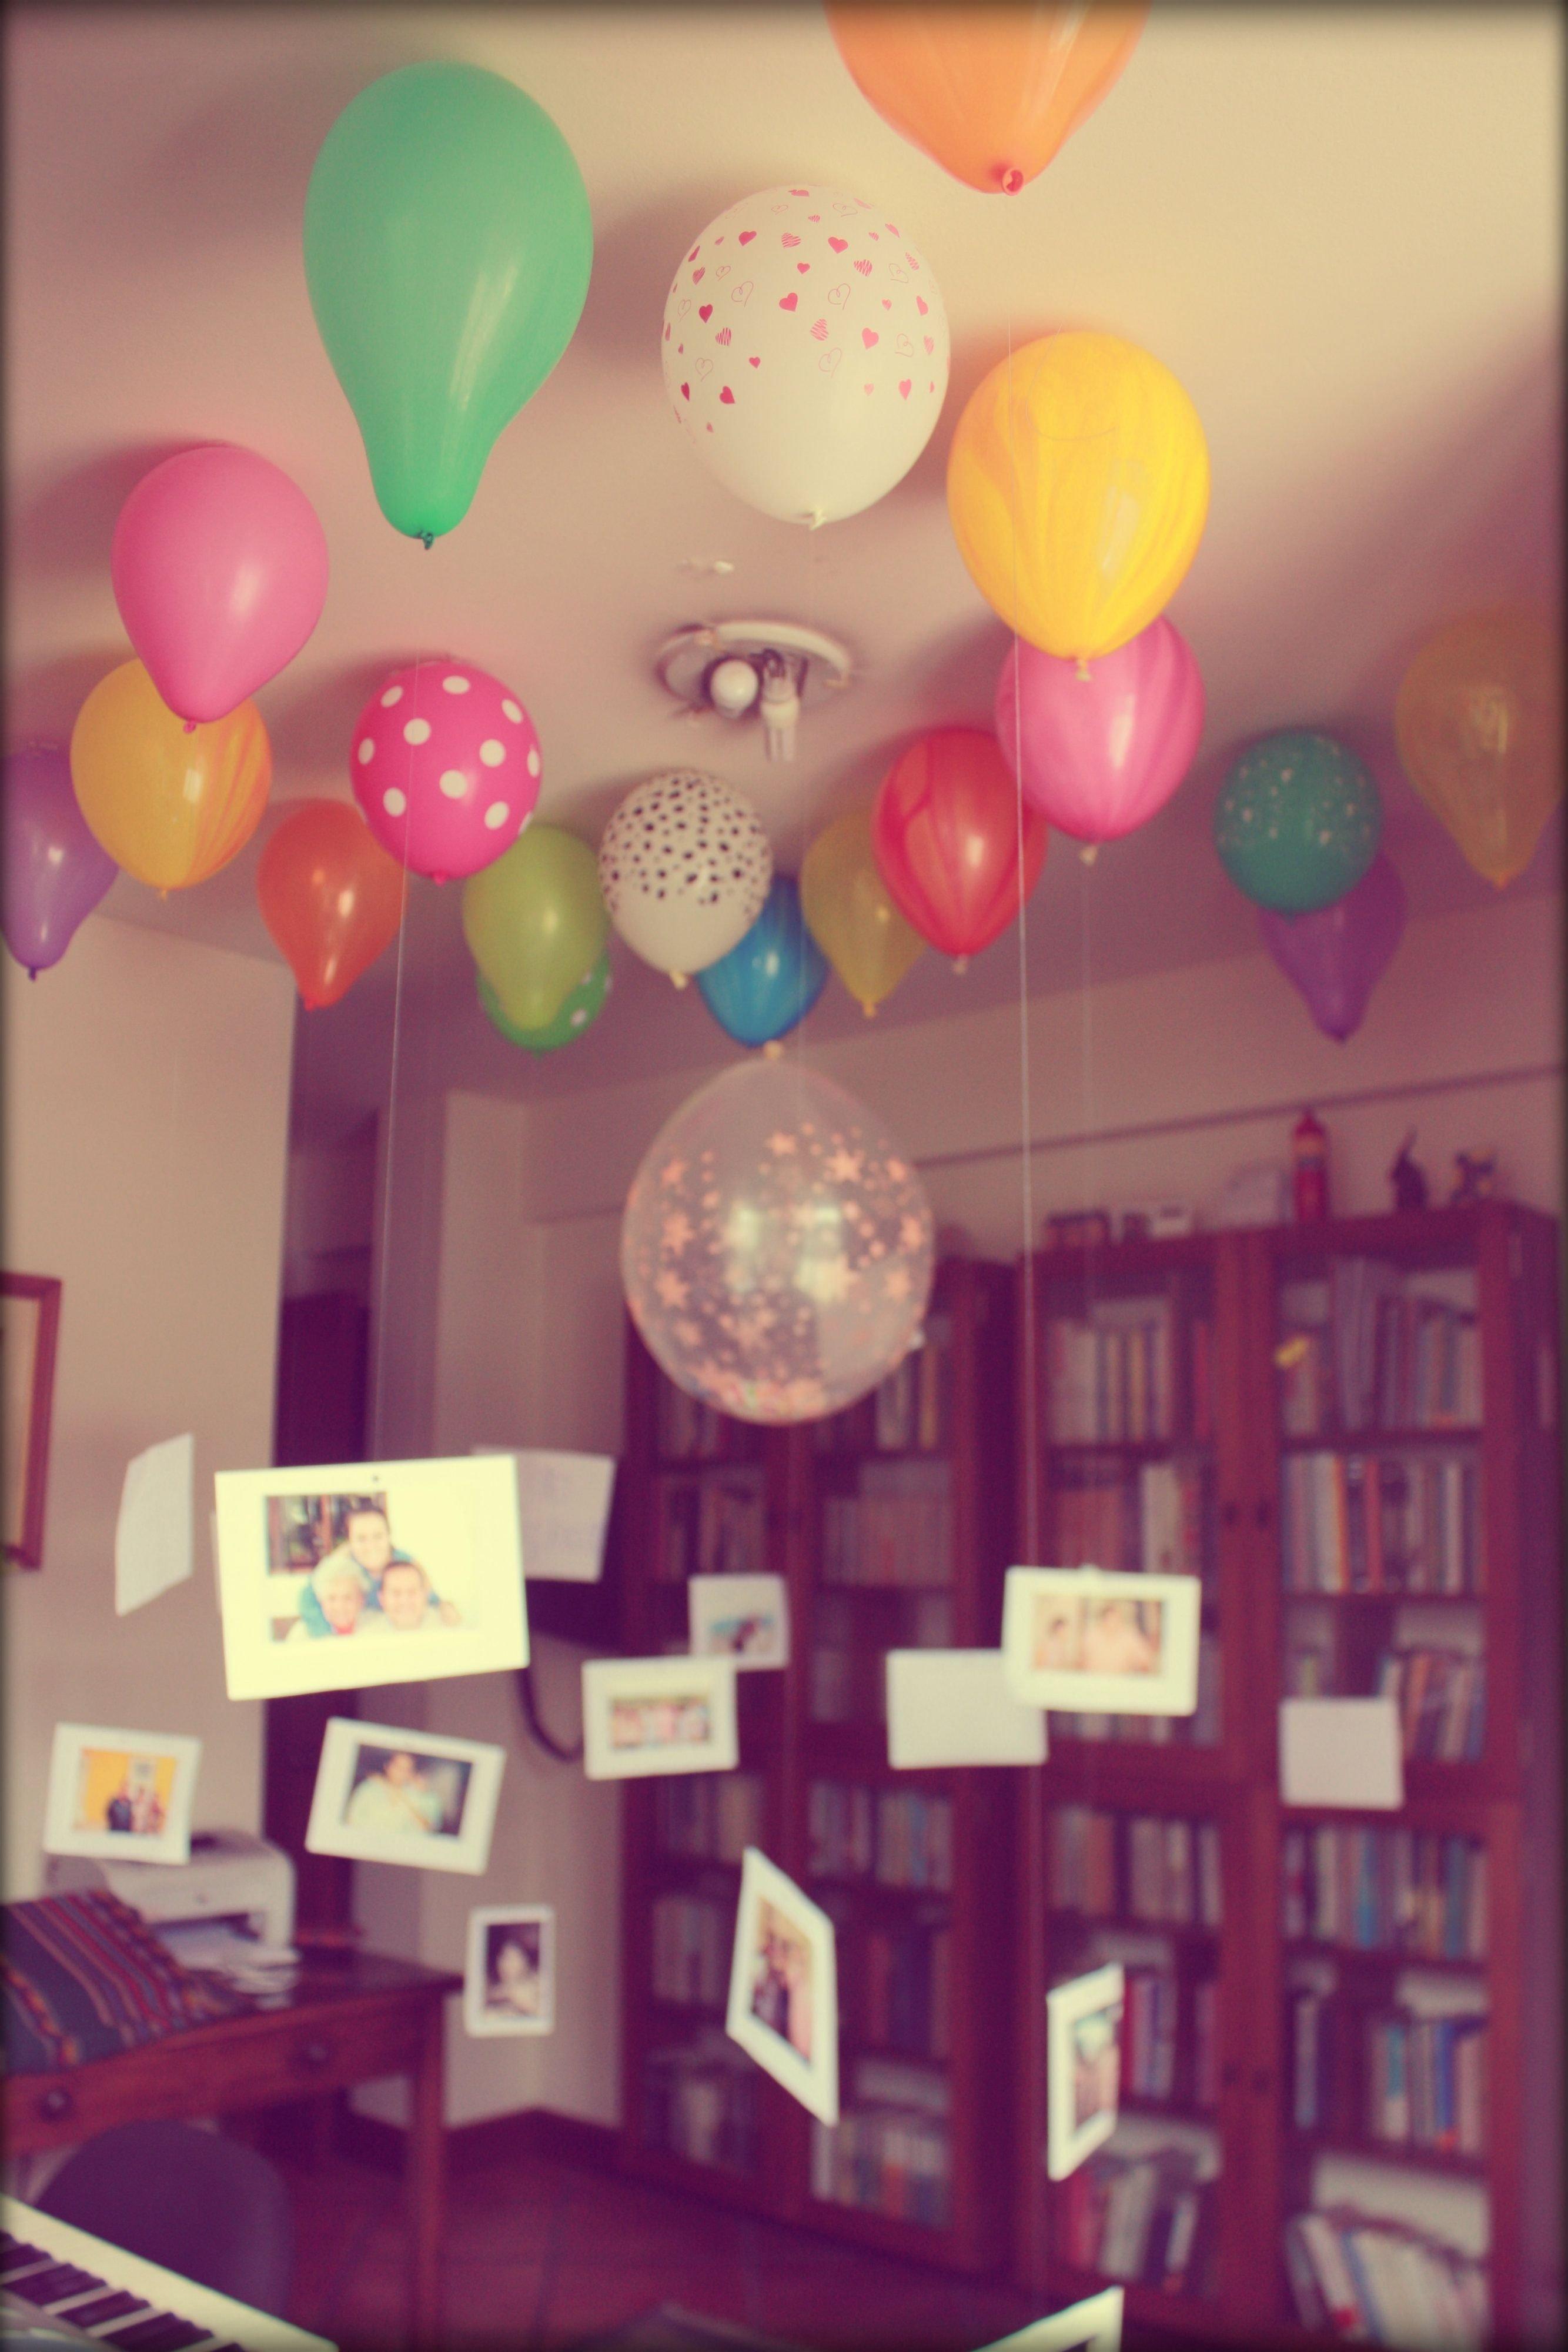 10 Attractive Surprise Birthday Party Ideas For Adults diy sorpresa sorpresa anniversary surprise diy birthday and 1